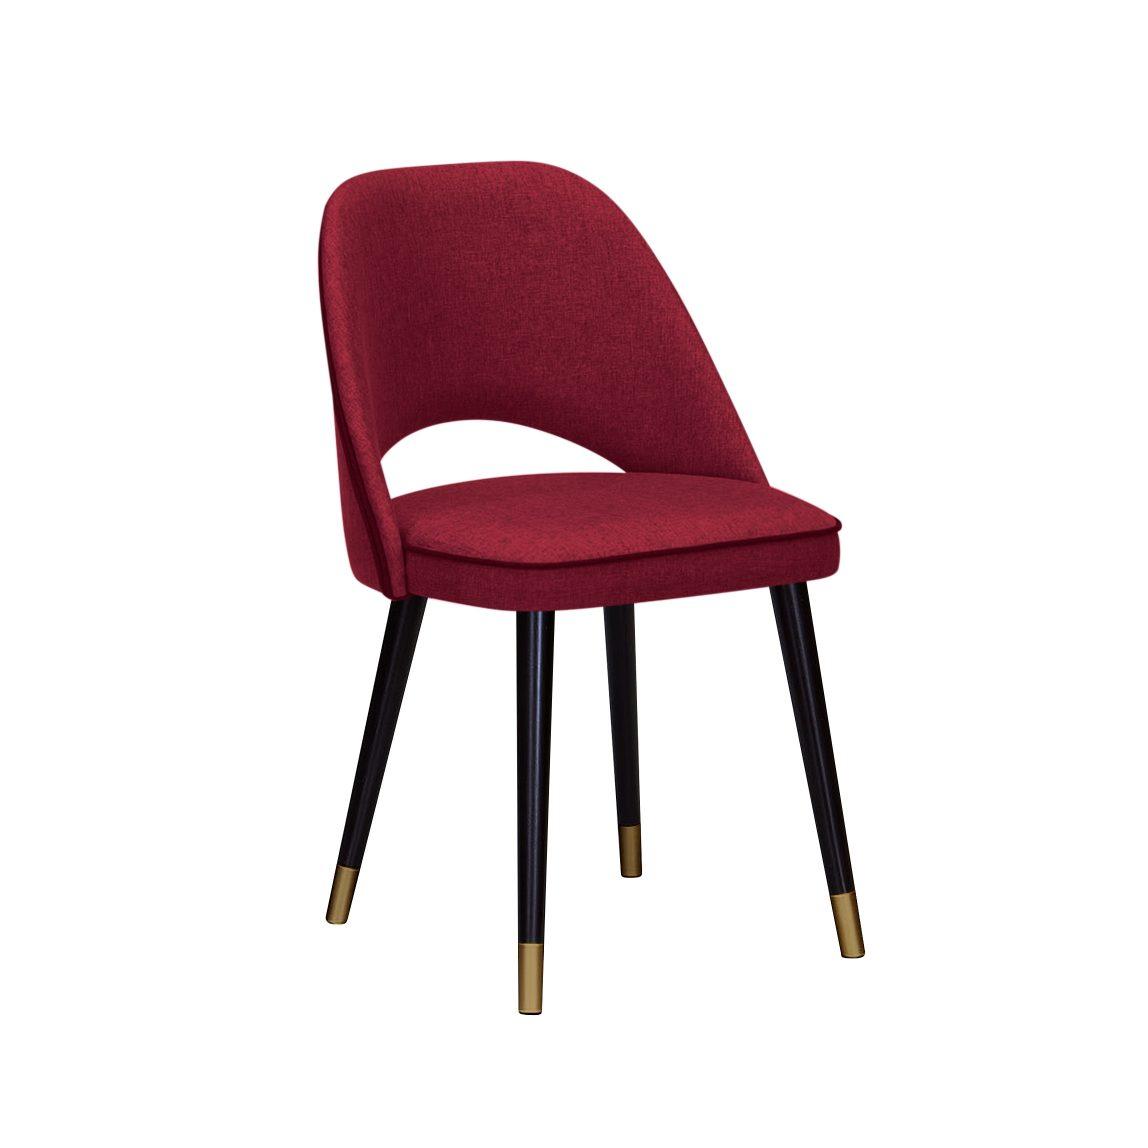 Обеденный стул Тайлер